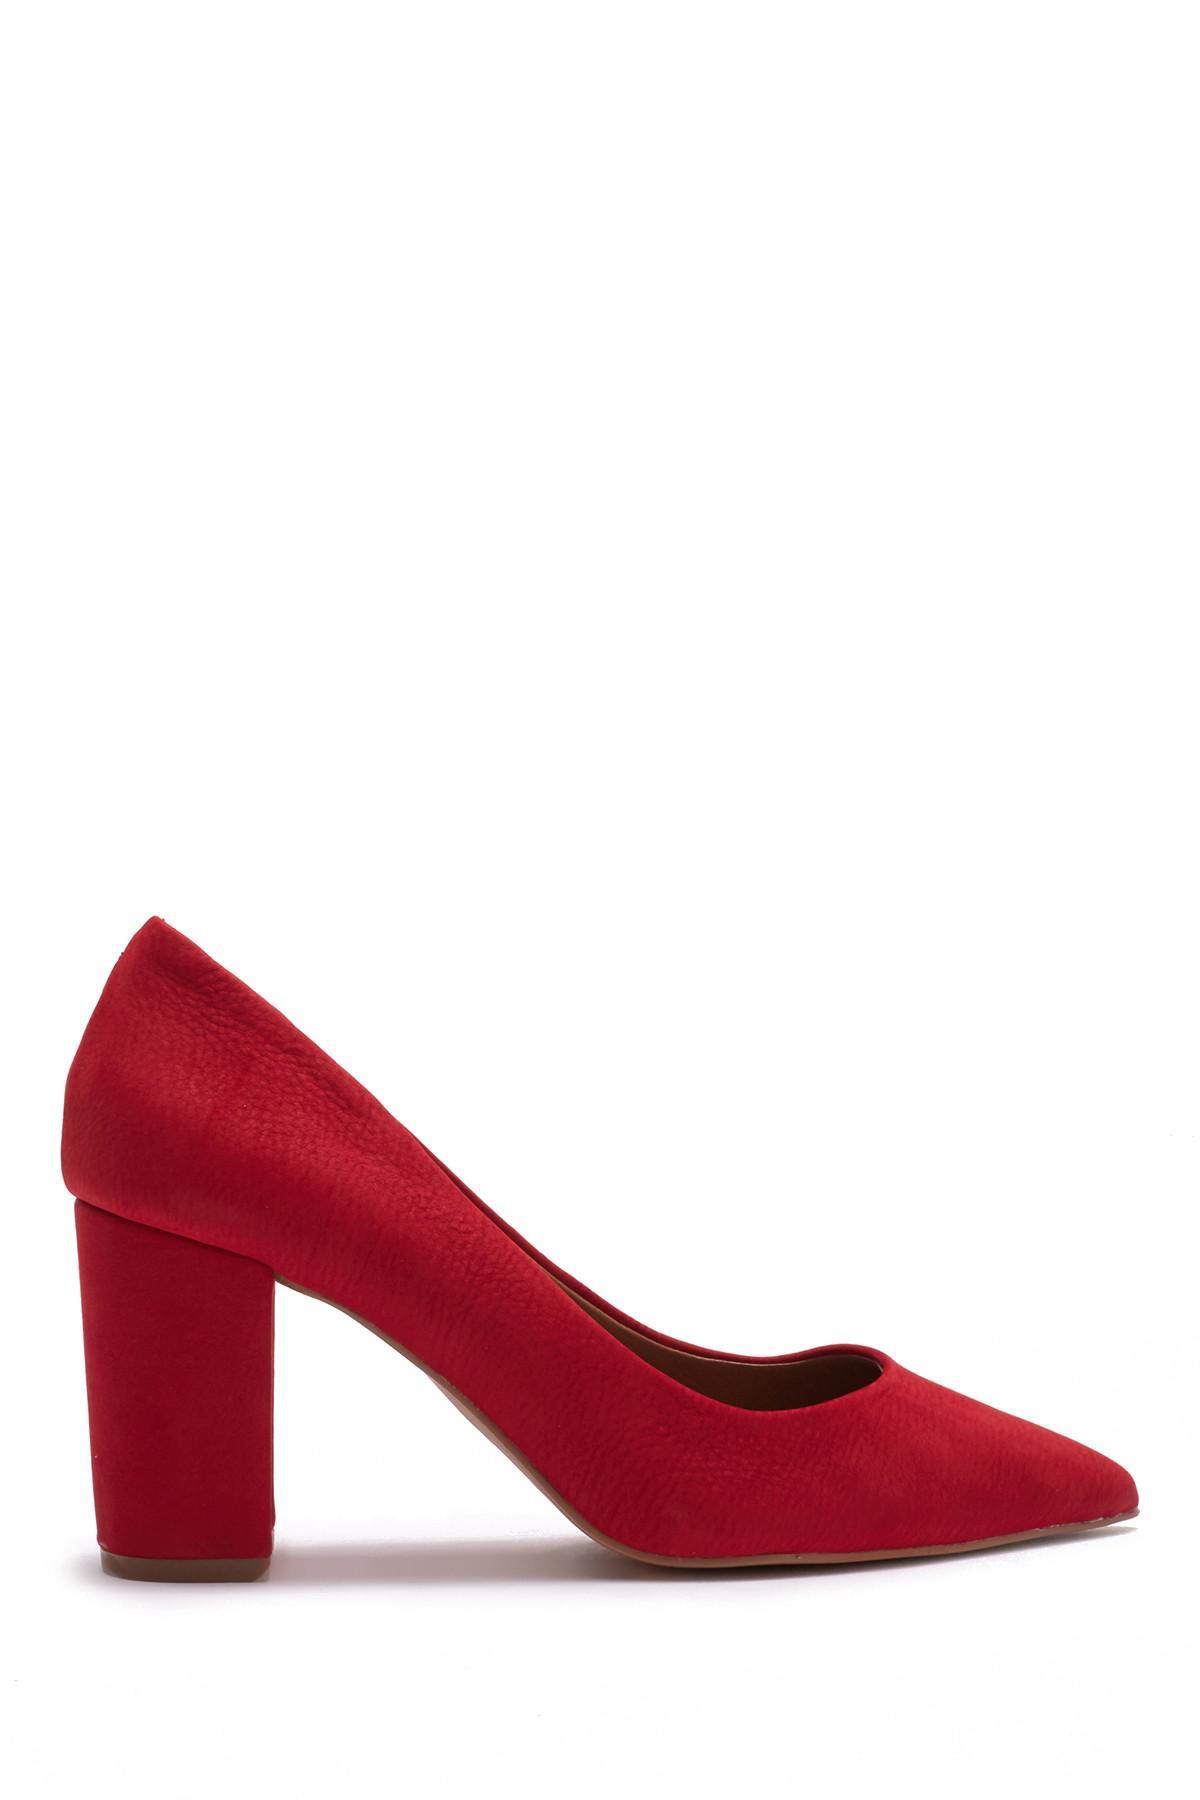 ce0c88cdd67 Lyst - Steve Madden Ashlyn Nubuck Leather Block Heel Pump in Red